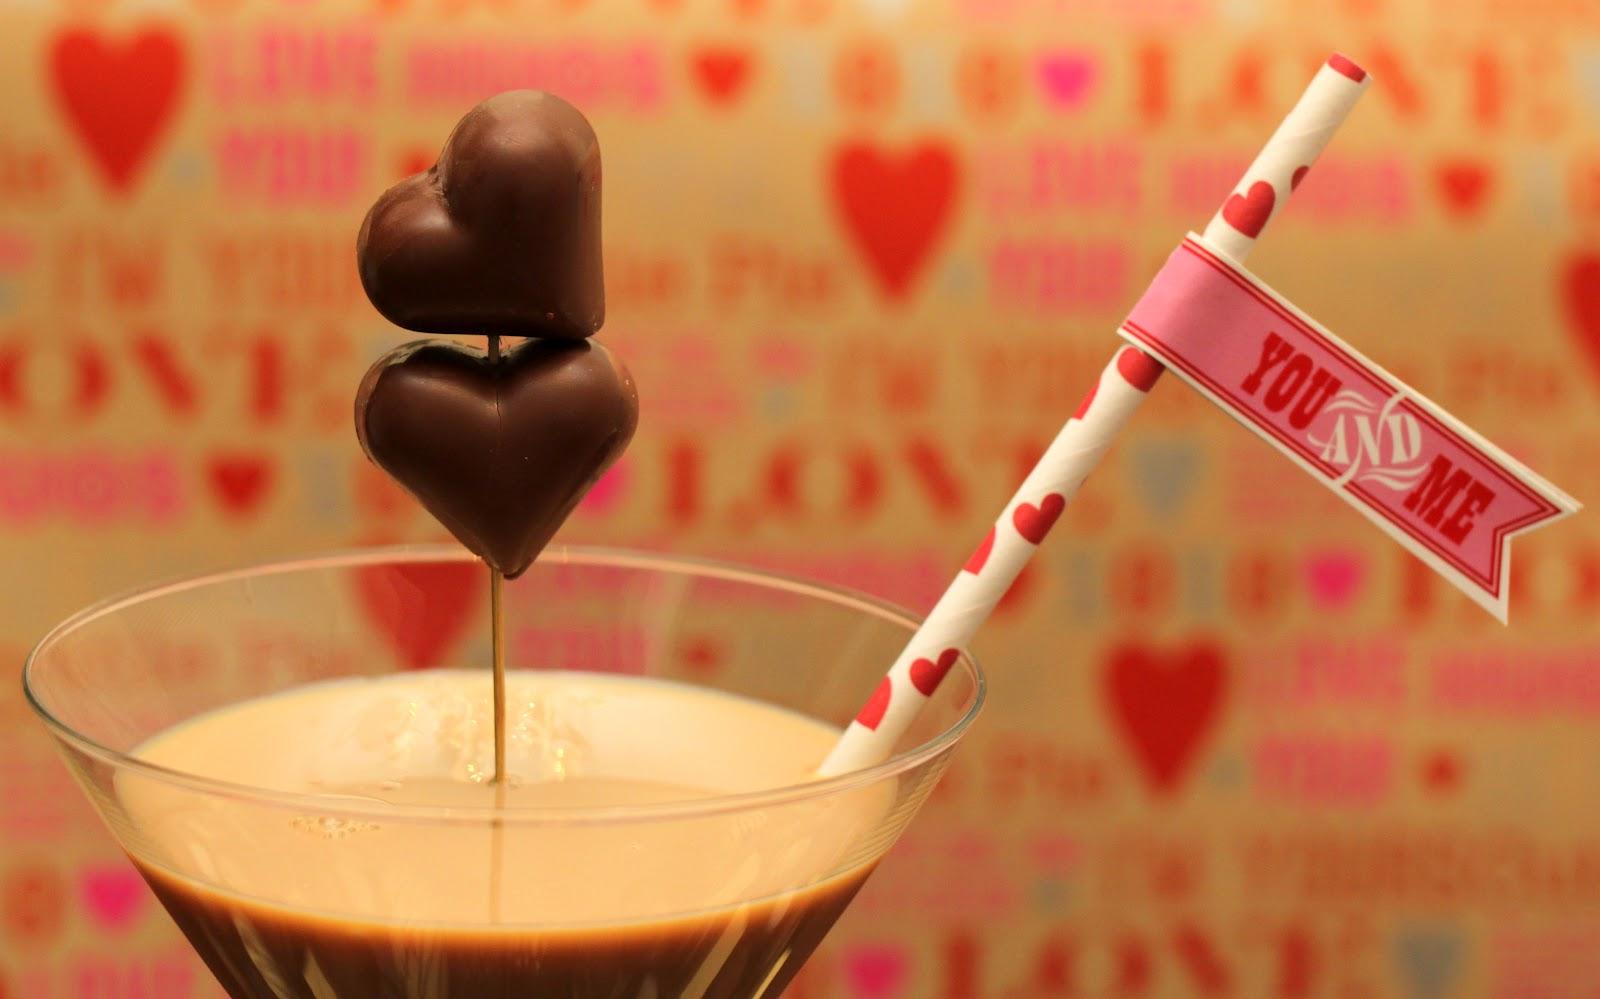 Doo dah a chocolaty cocktail for valentine 39 s day for Best cocktails for valentine s day